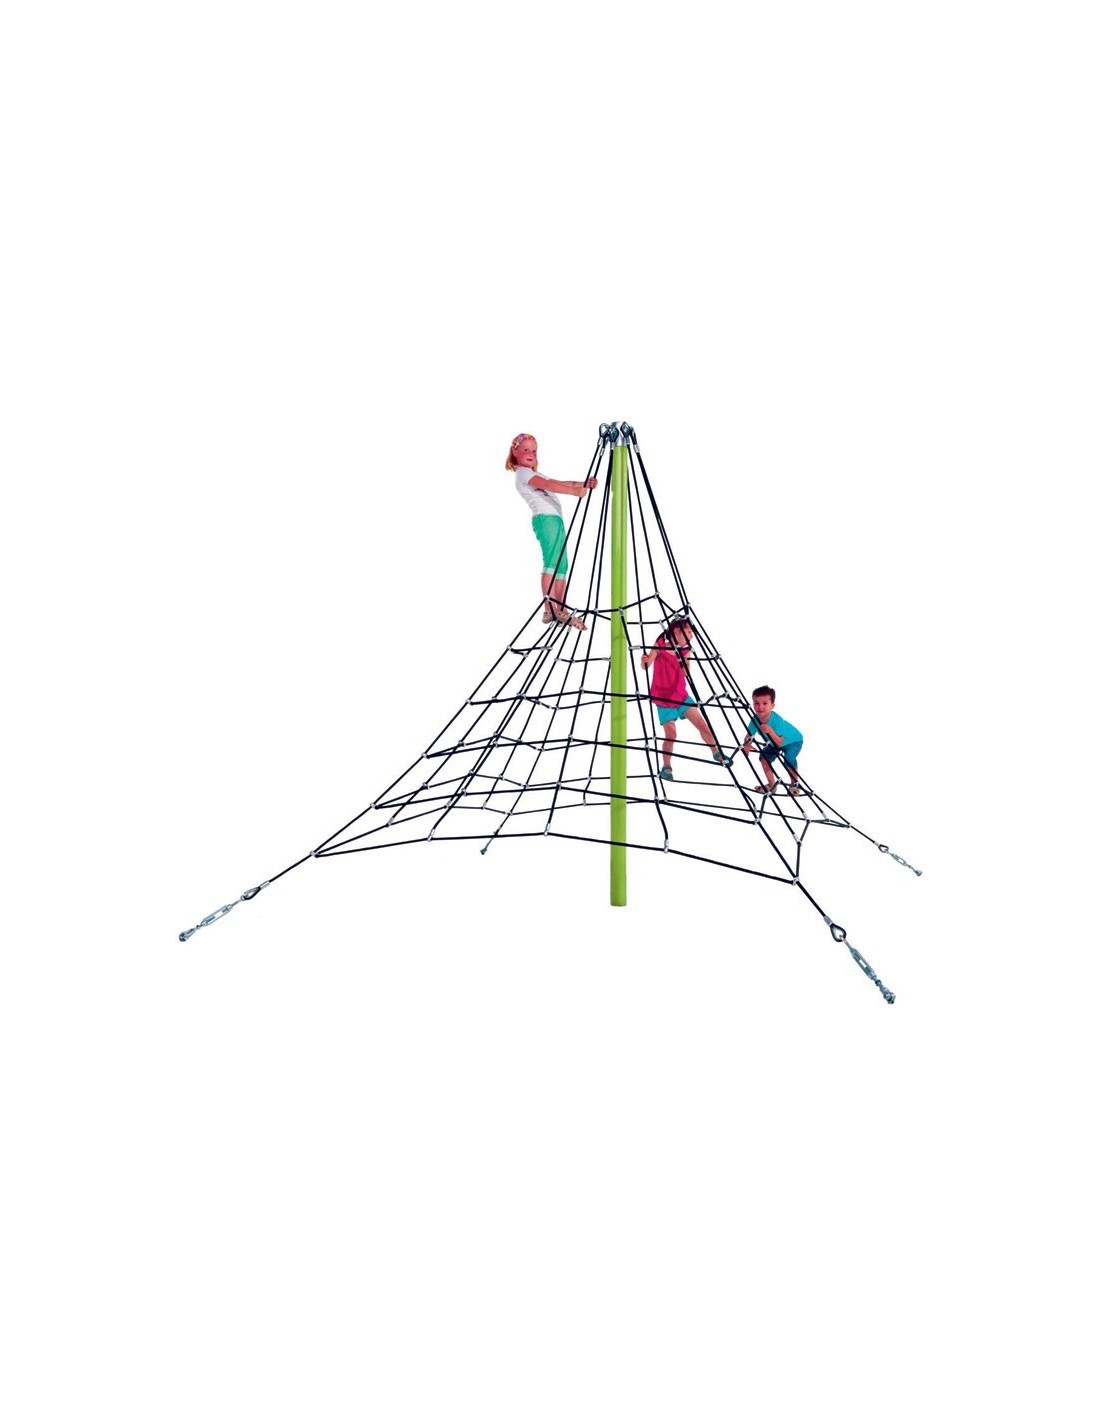 pyramide en filet de corde arm e araign e. Black Bedroom Furniture Sets. Home Design Ideas